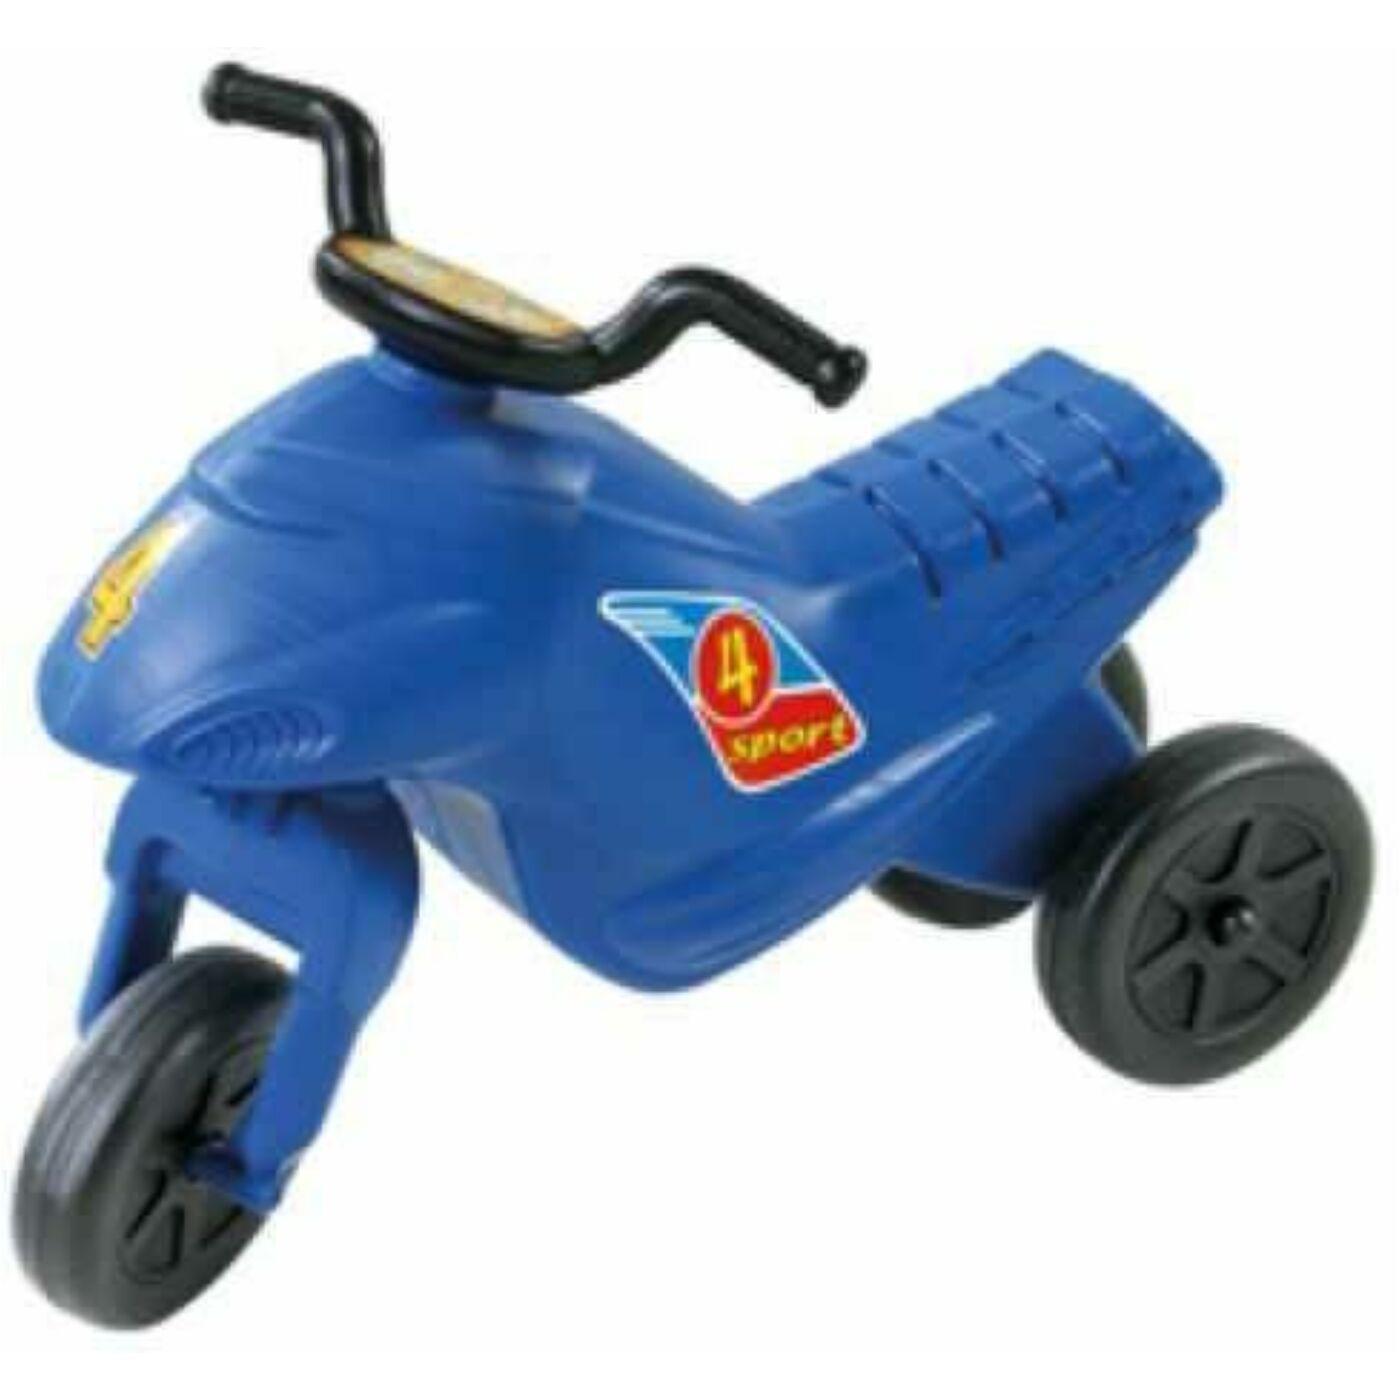 141 Super Bike 4 mini